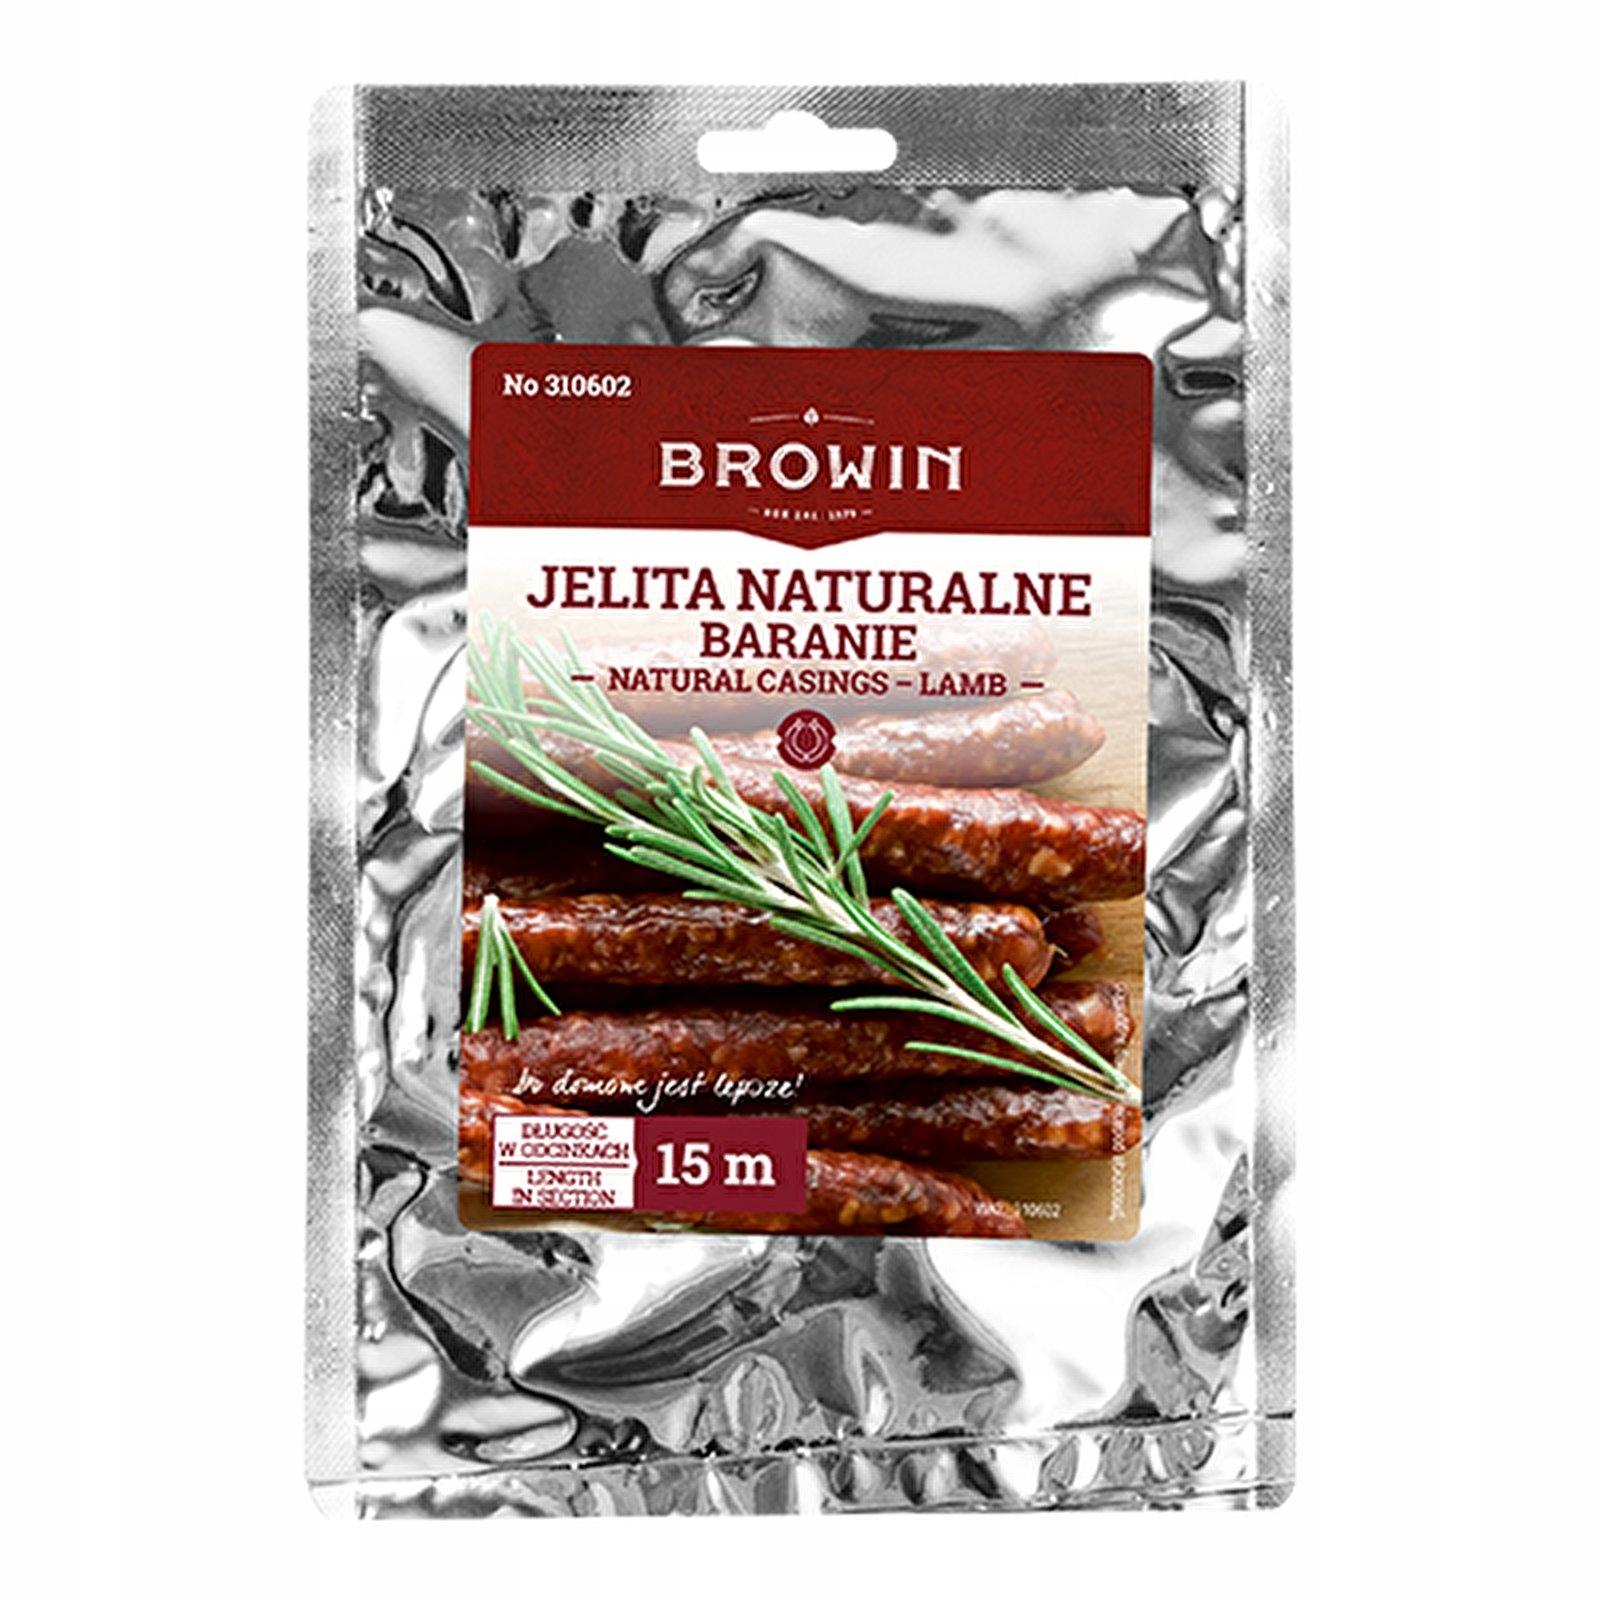 Jelita Naturalne Baranie 18 20mm Kielbasa 15m 6002722018 Allegro Pl